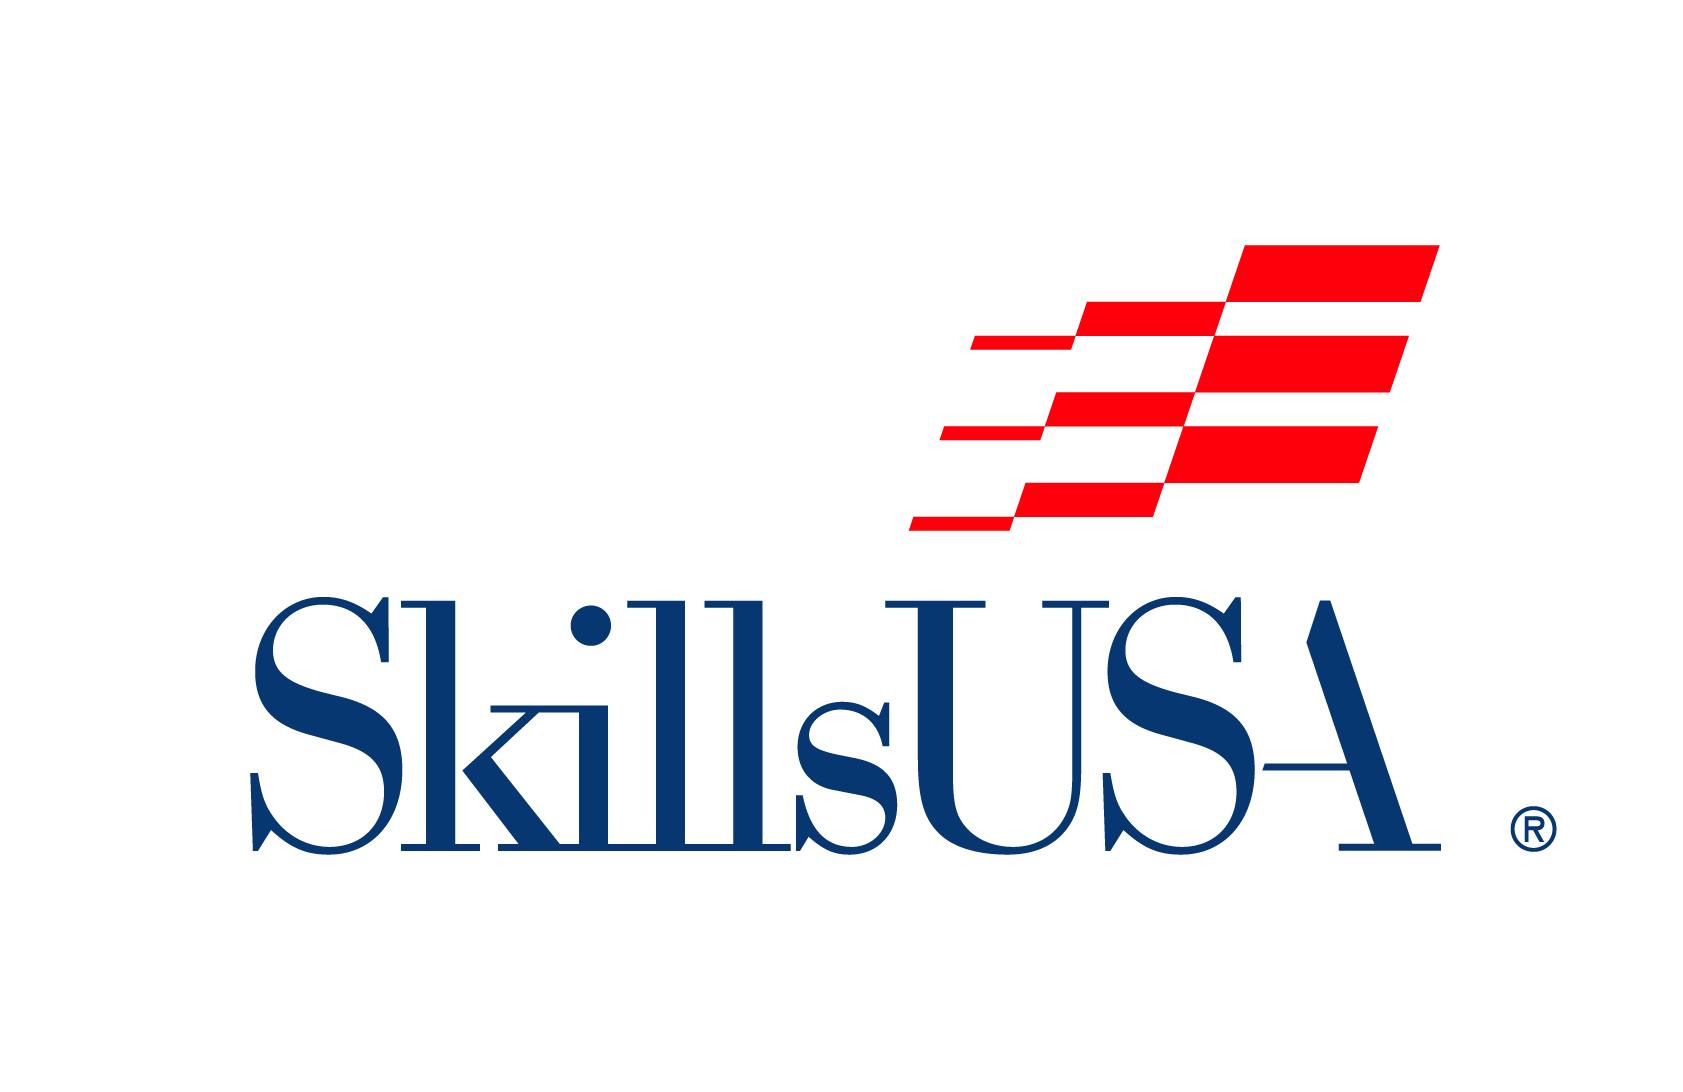 skills usa on career technical education and stem learning for skills usa